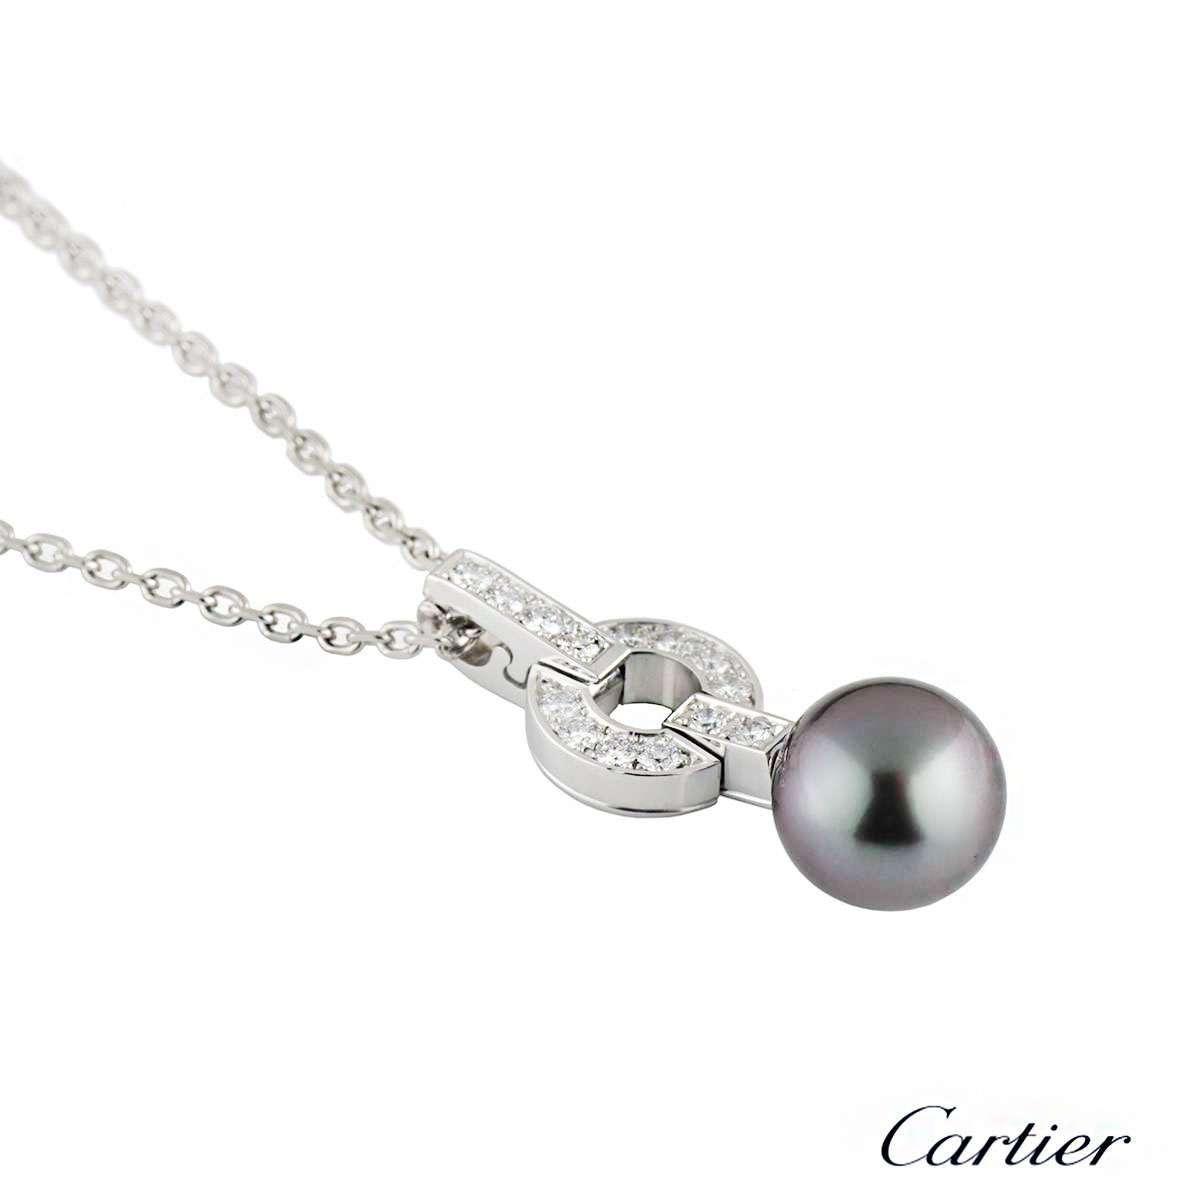 Cartier Himalia Diamond & Pearl Necklace B3038300